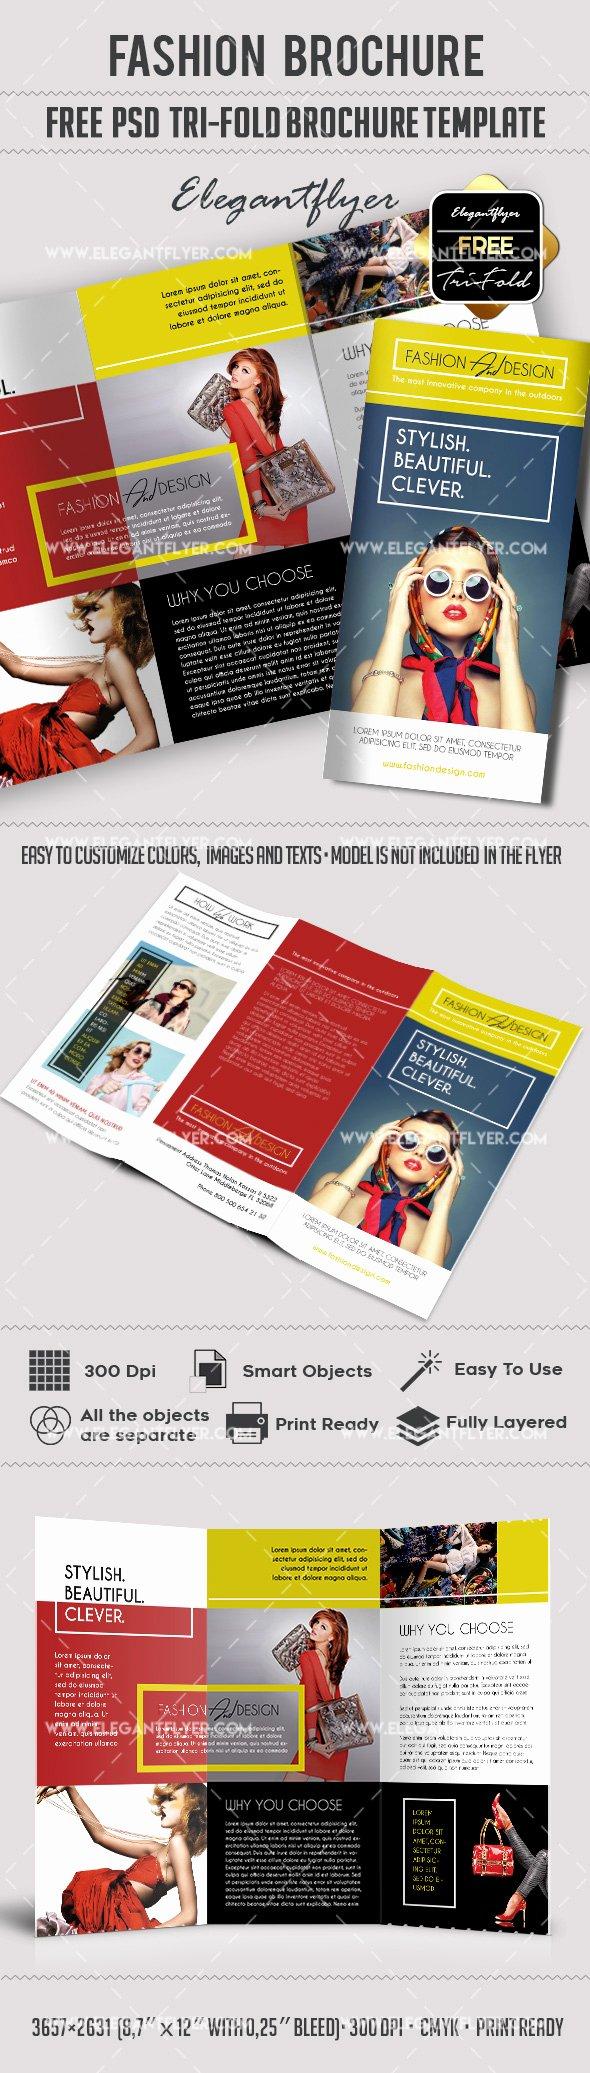 Tri Fold Brochure Template Psd Fresh Fashion – Free Tri Fold Psd Brochure Template – by Elegantflyer